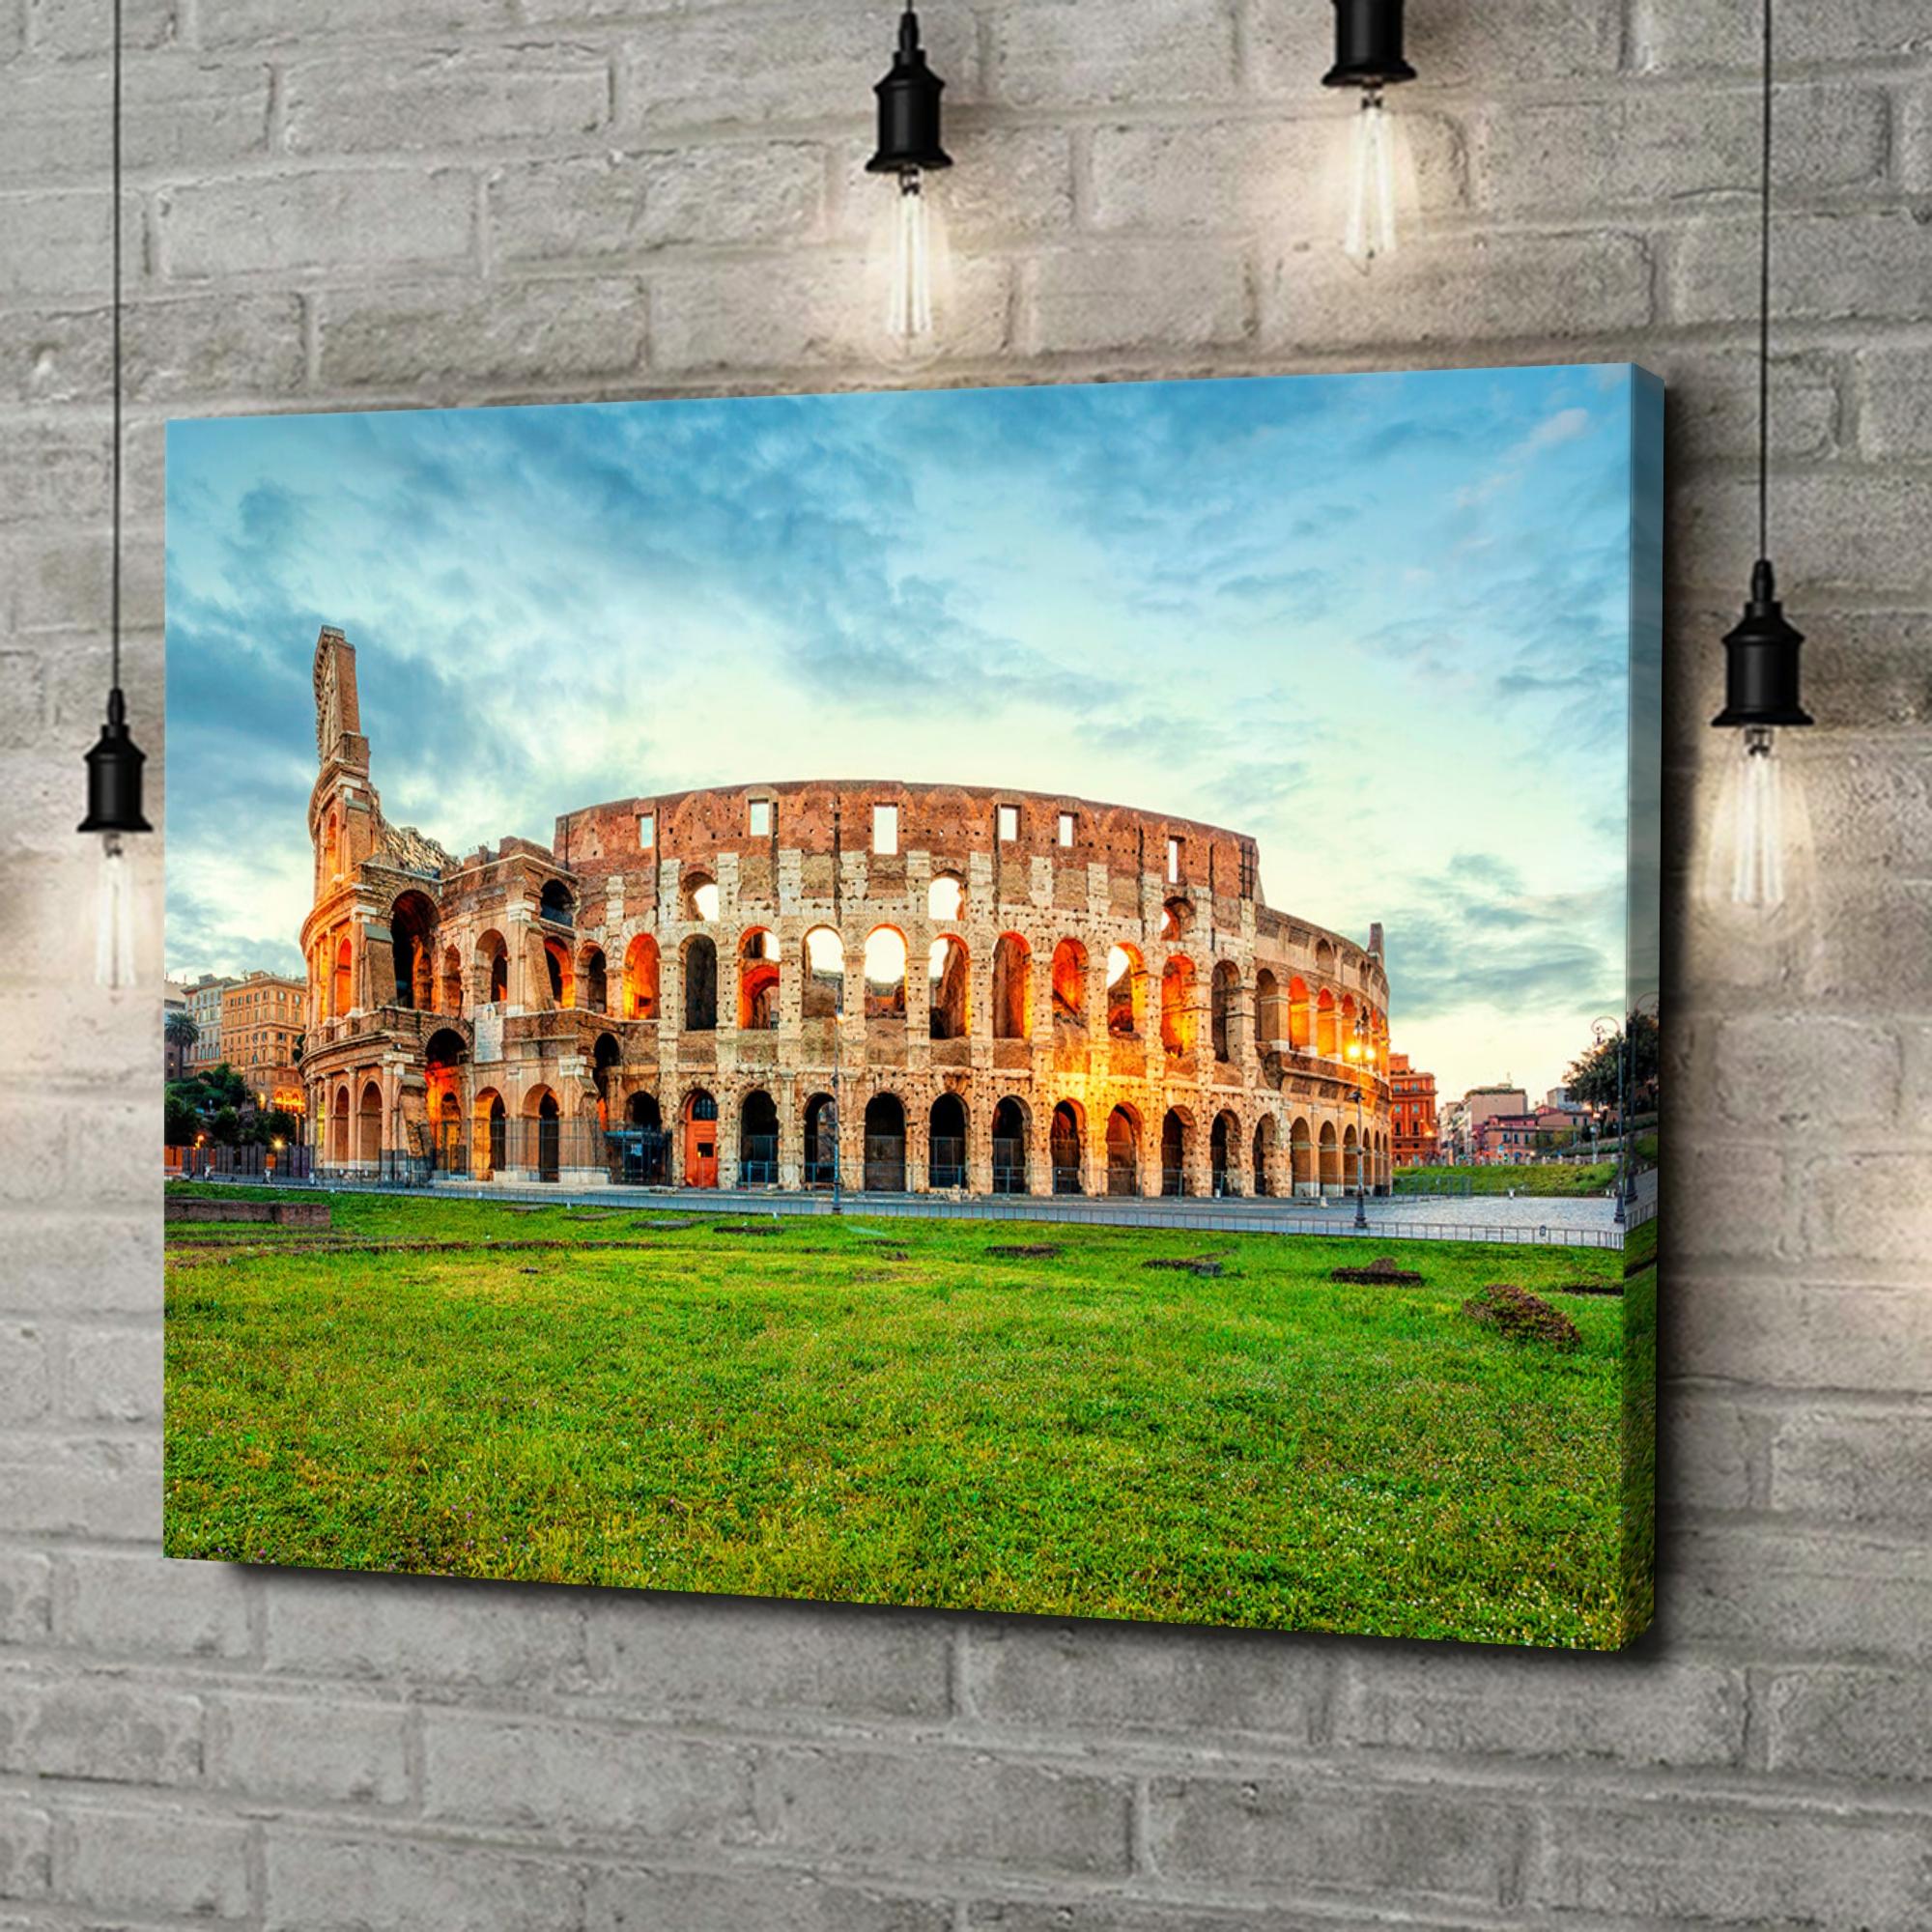 Leinwandbild personalisiert Kolosseum Rom